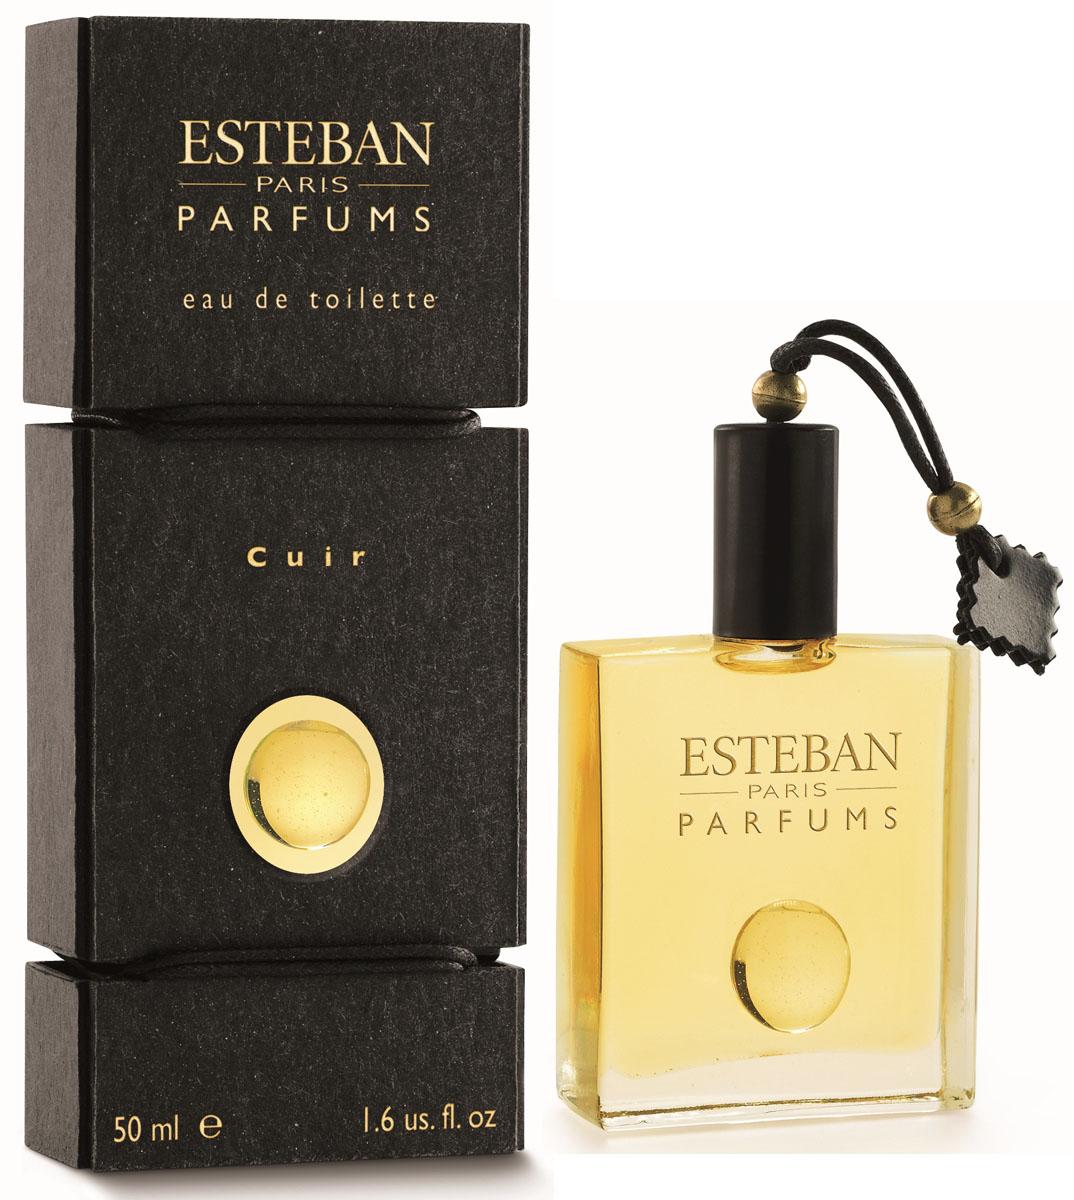 Esteban Collection Les Matieres Туалетная вода Cuir 50 млCPA-049